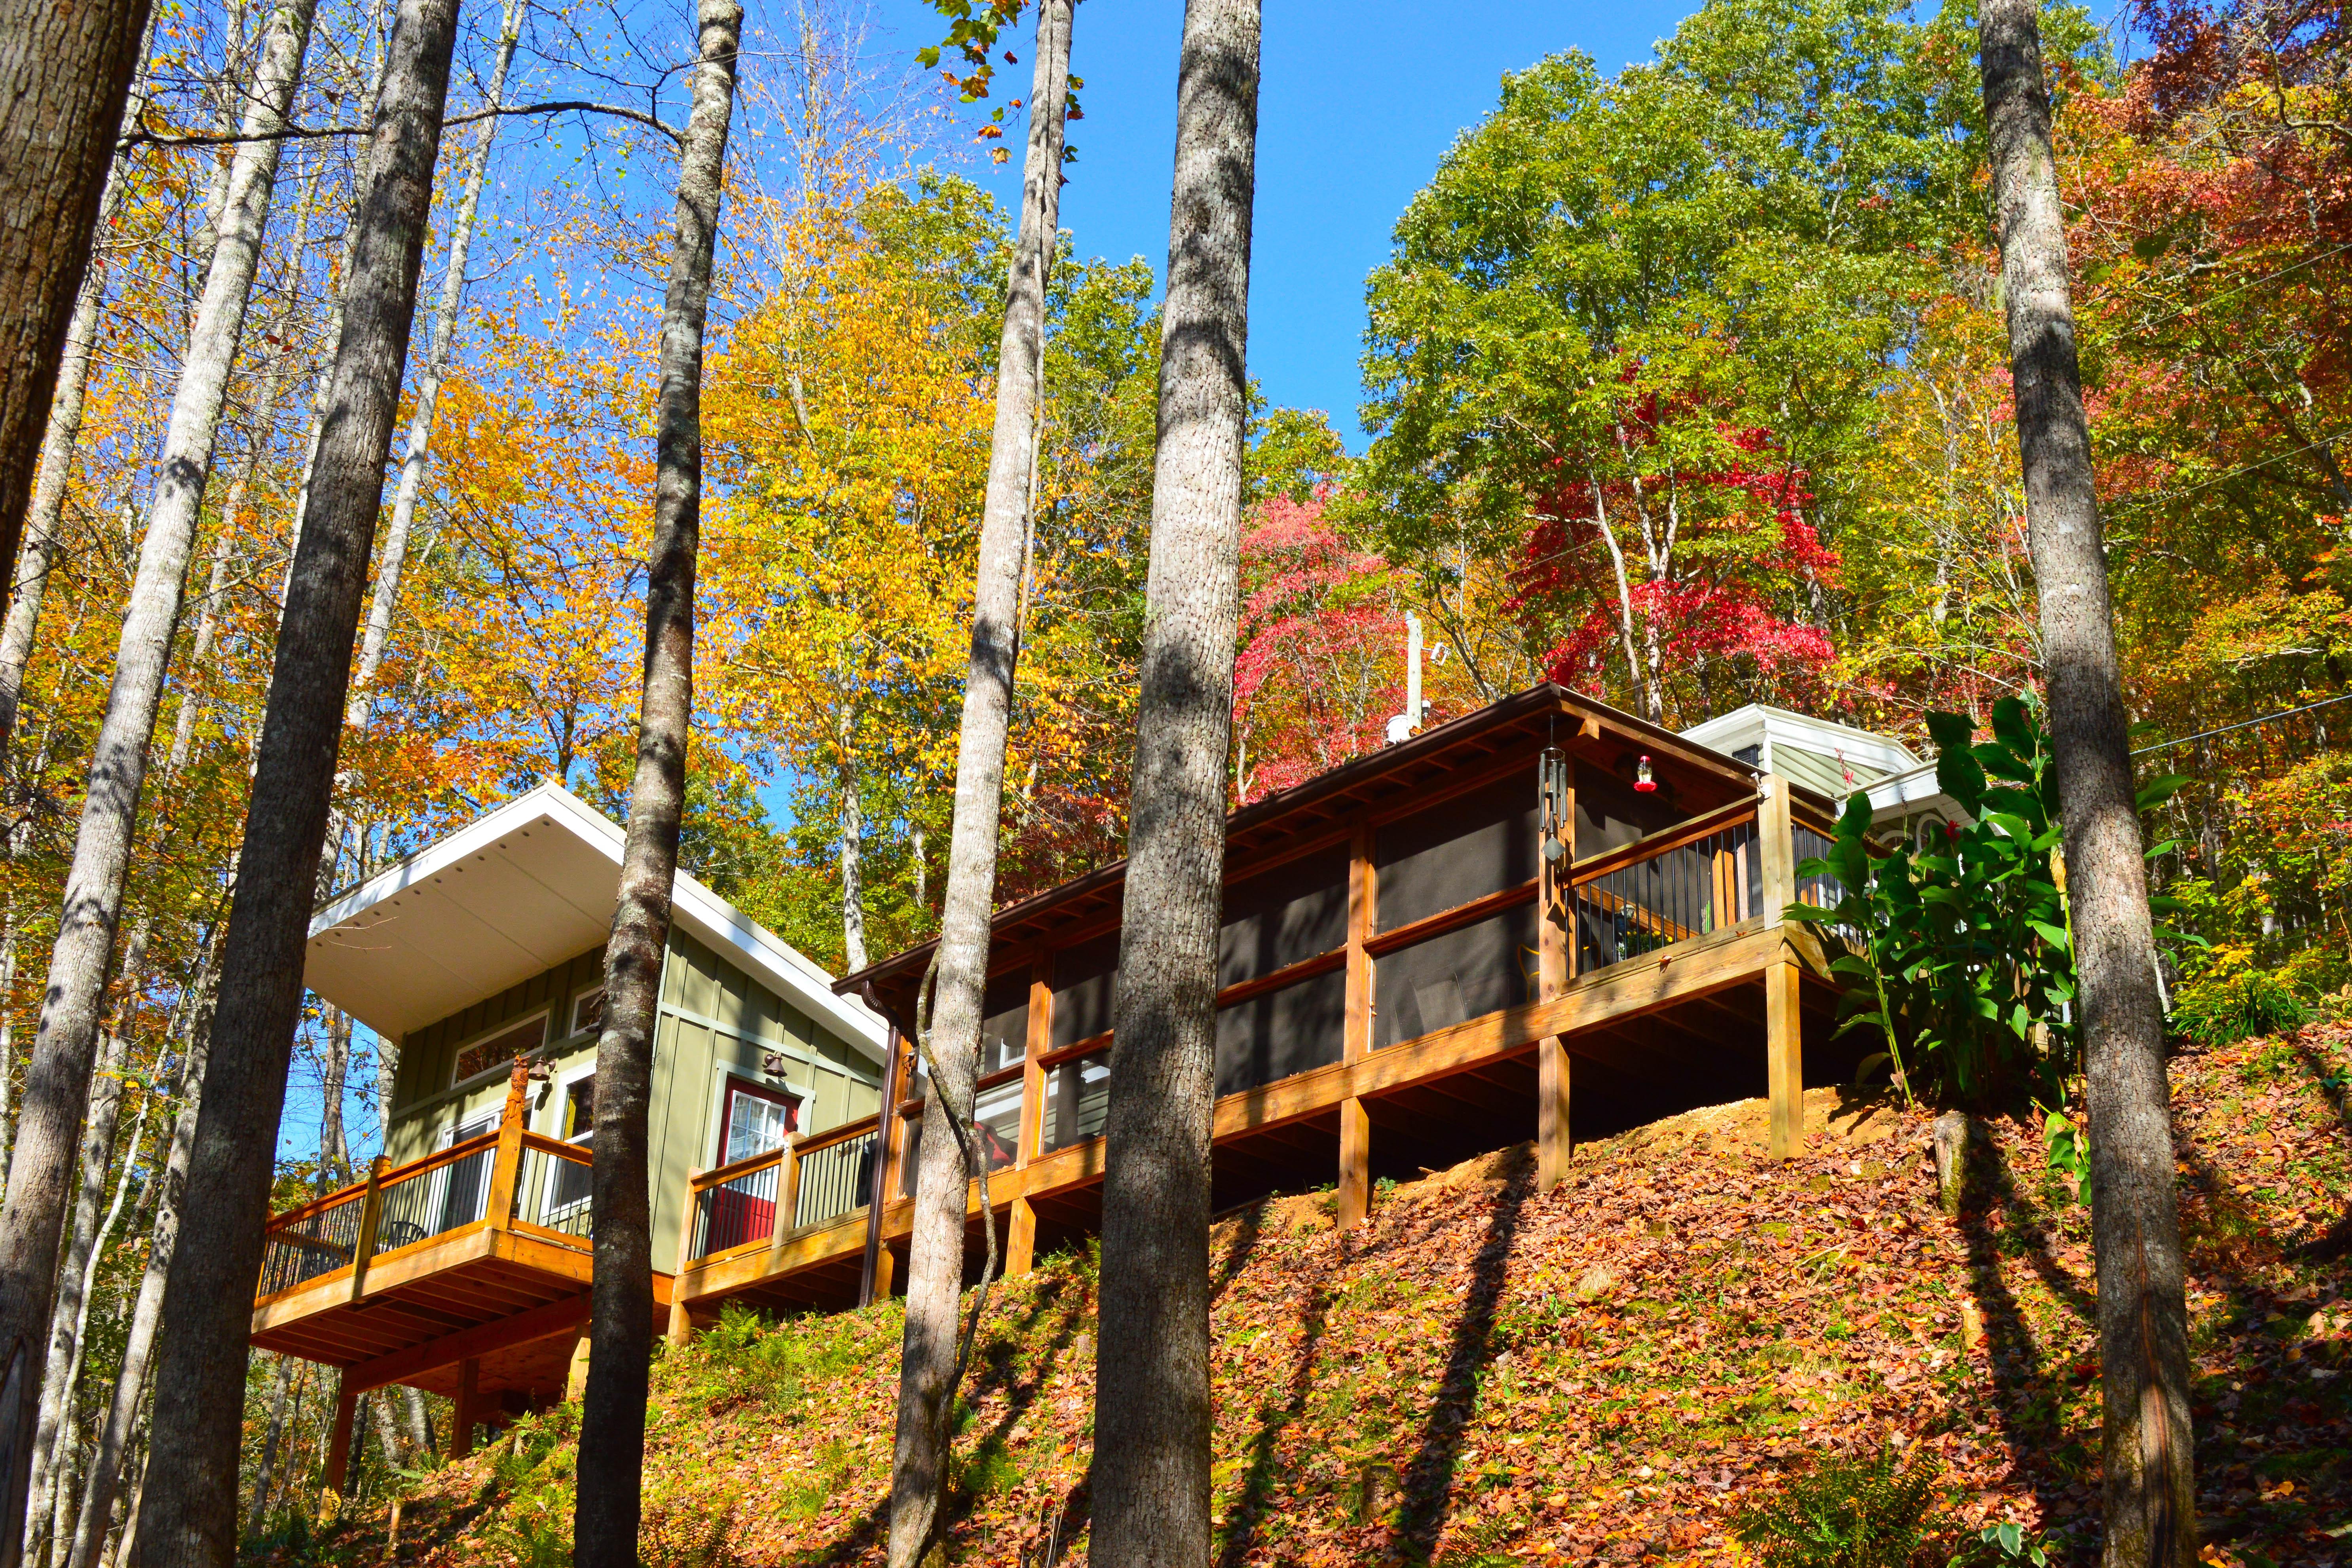 Cabin for rent in nantahala national forest for The cabins at nantahala